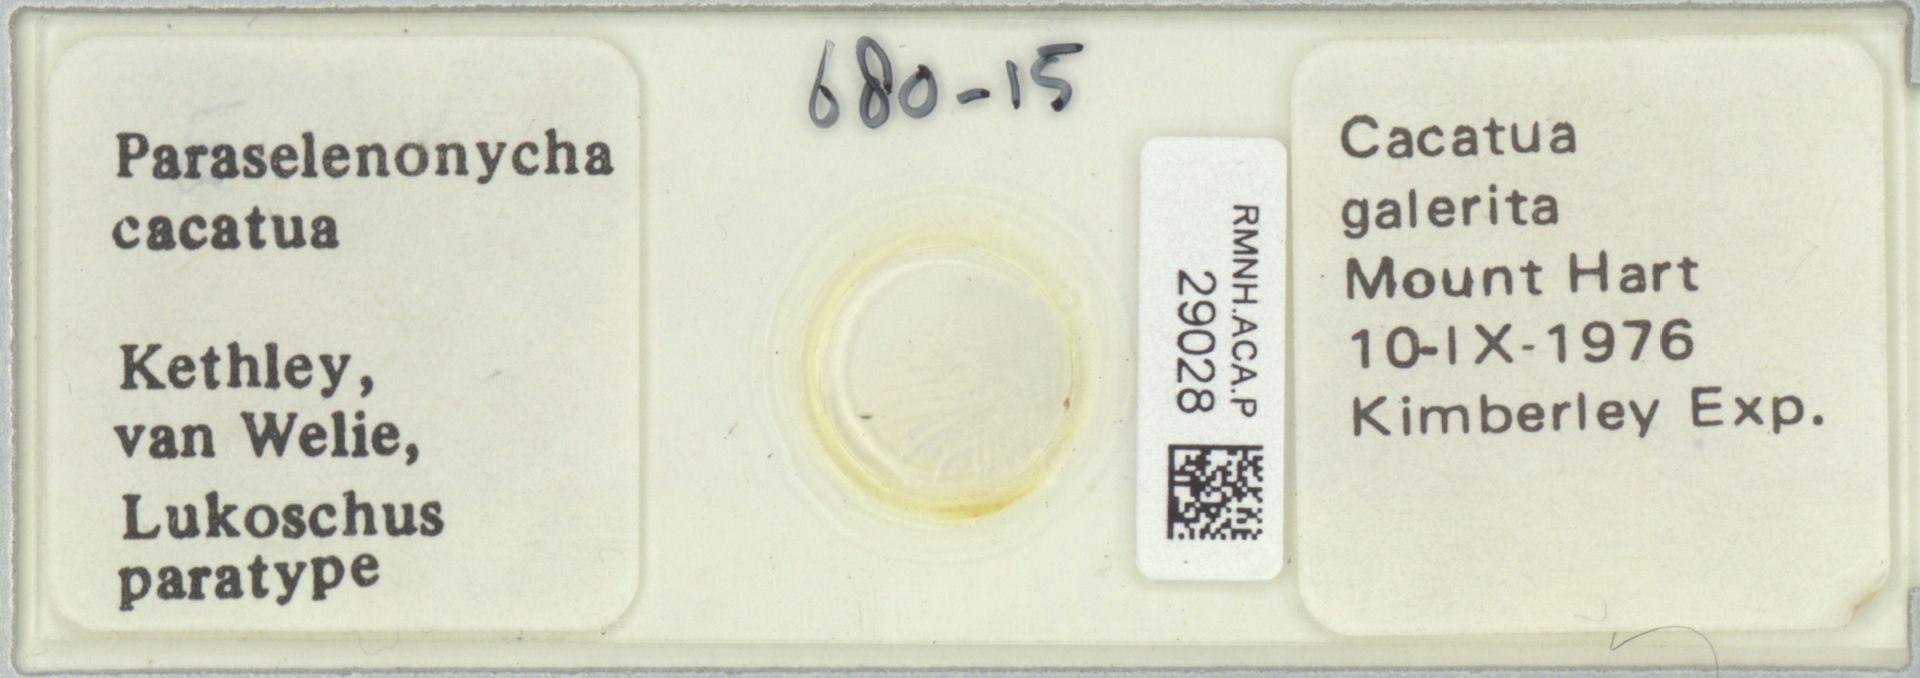 RMNH.ACA.P.29028 | Paraselenonycha cacatua Kethley, van Welie, Lukoschus